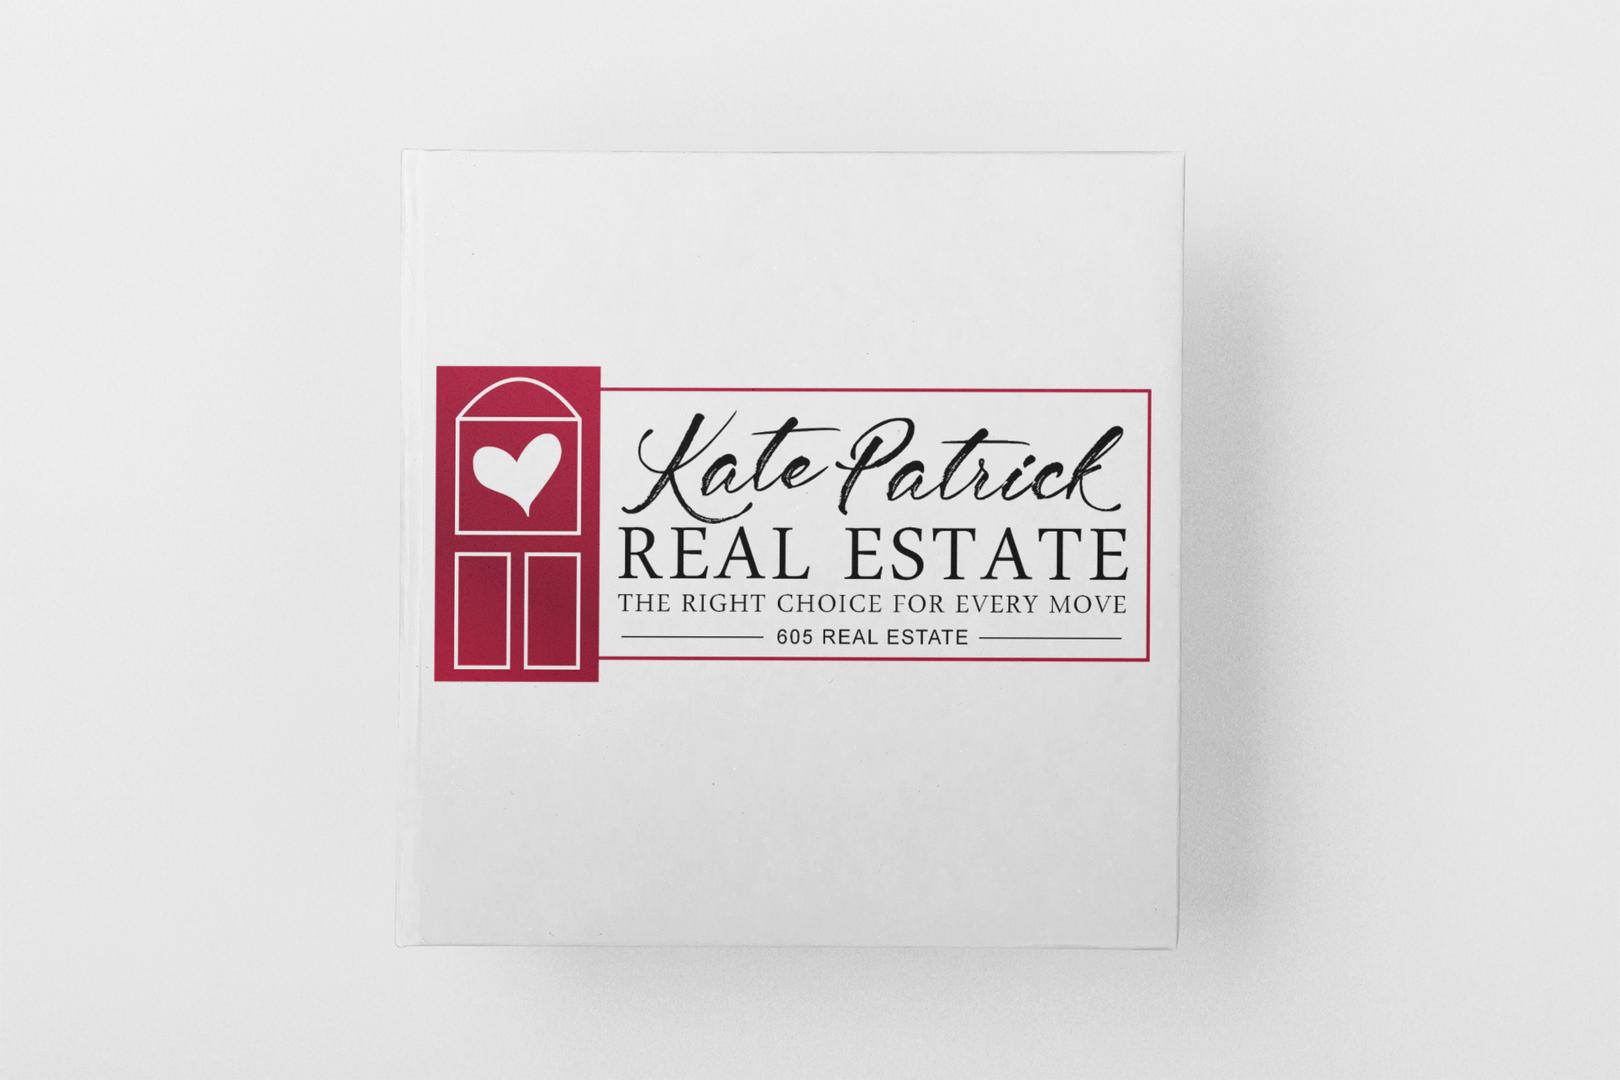 Kate Patrick Real Estate